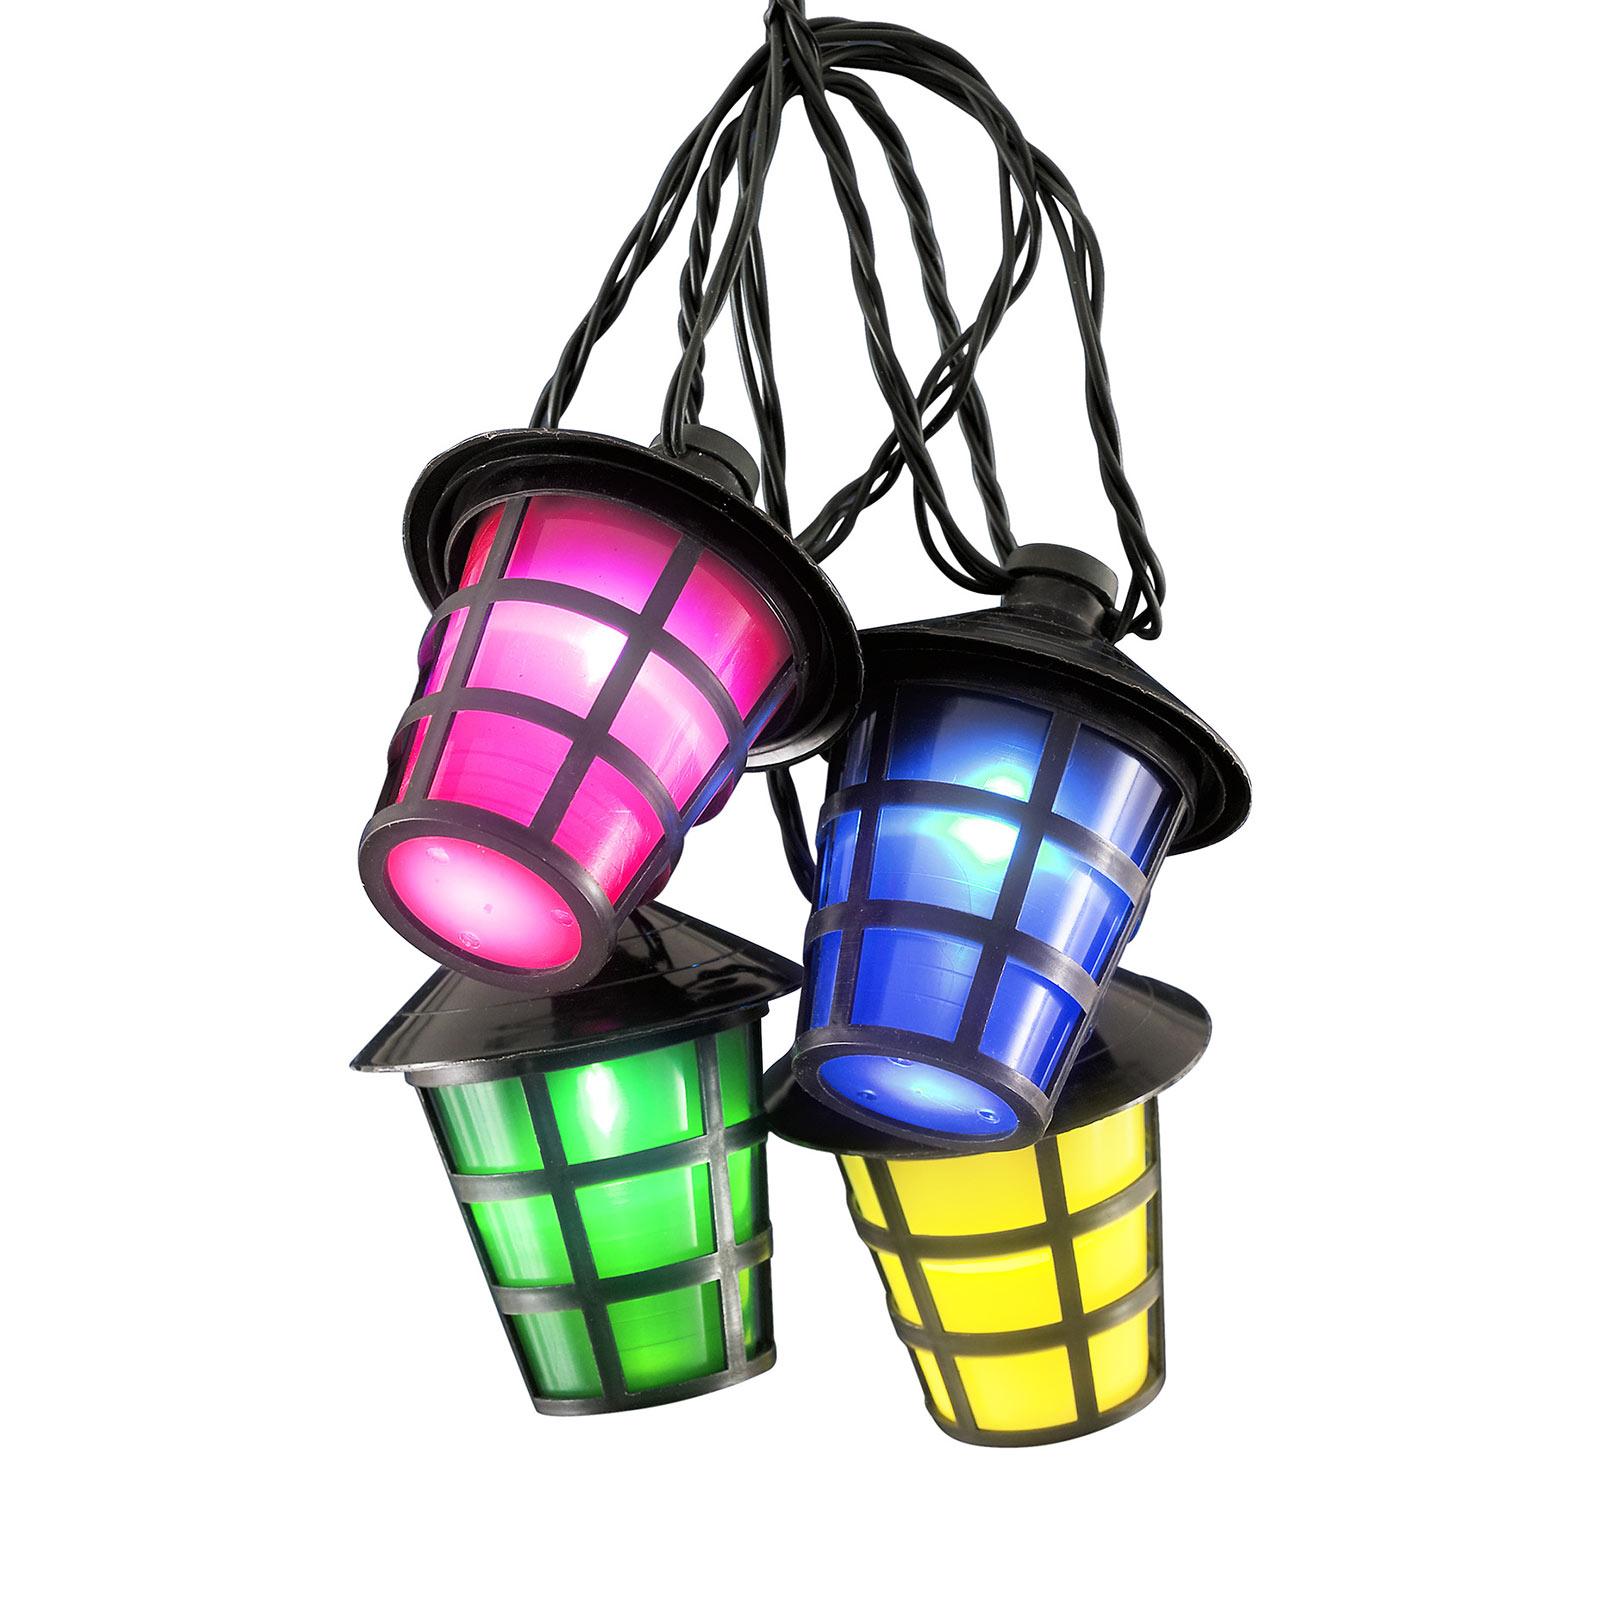 Lichtket v buiten Lampion 20 LED lantaarns kleurr